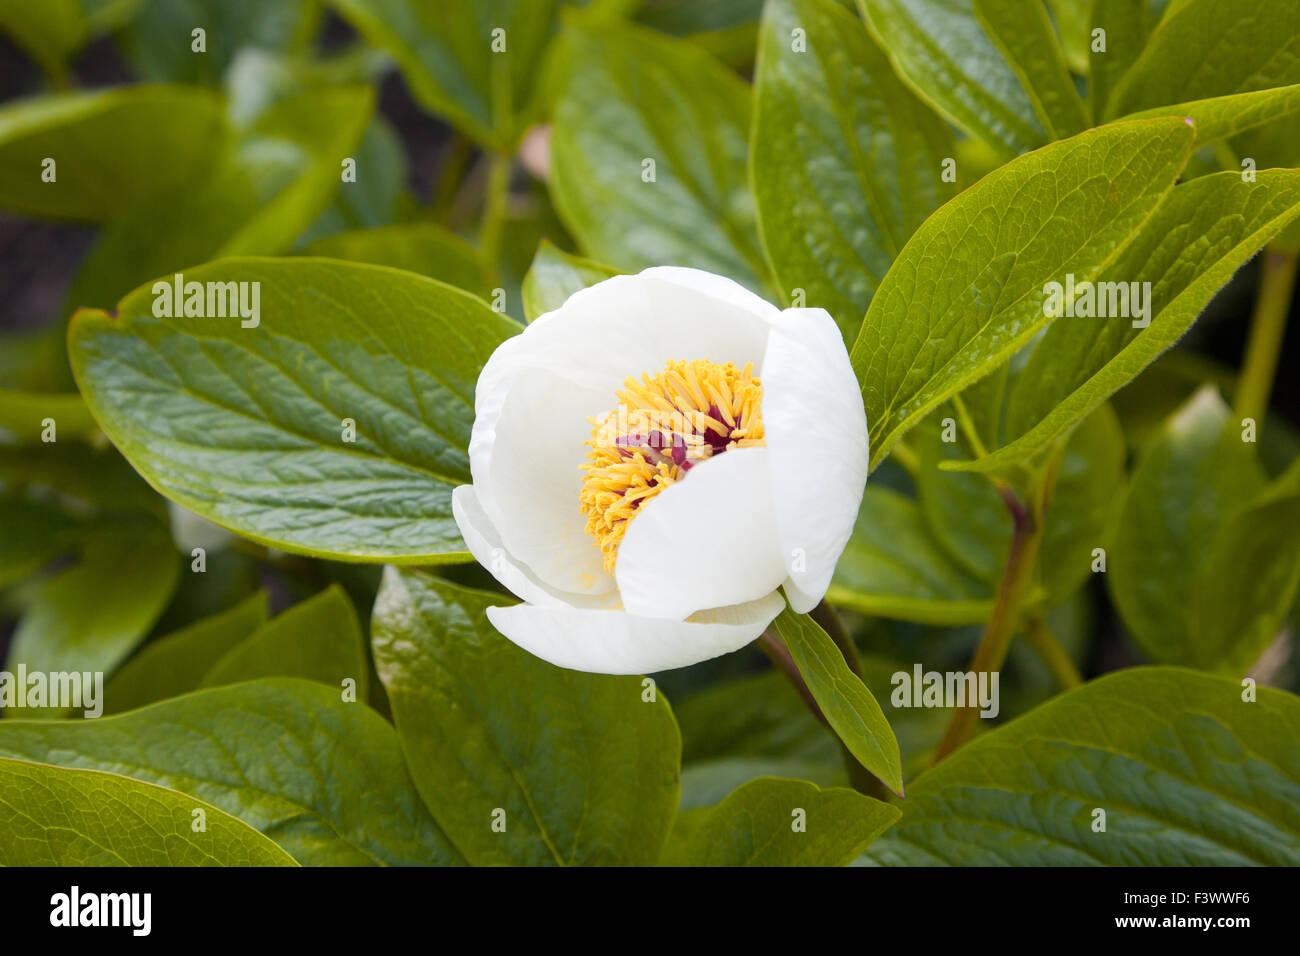 Macro of paeonia officinalis stock photo royalty free for Paeonia officinalis